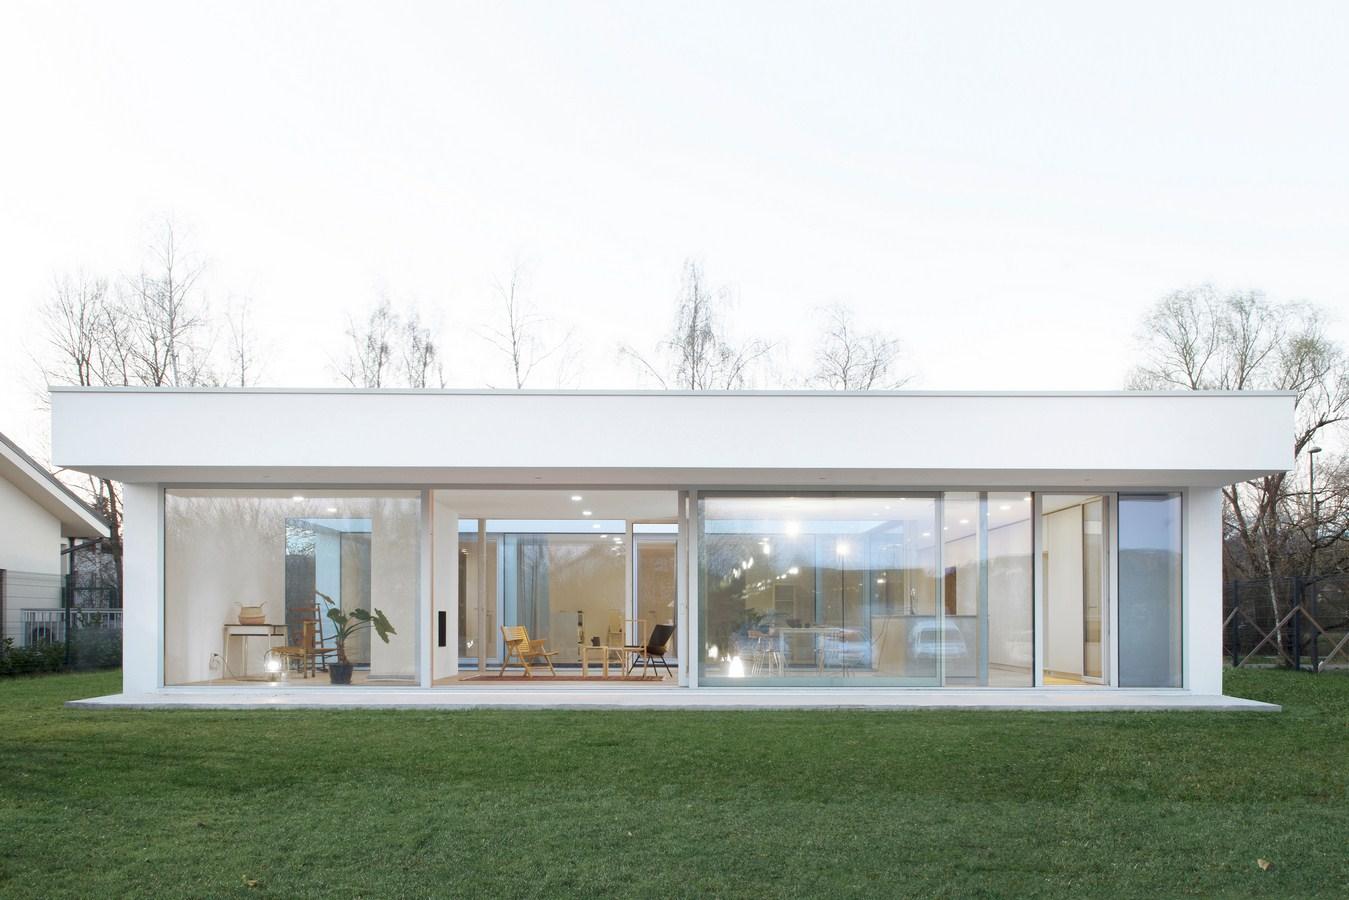 Patio House By ARHITEKTURA - Sheet6